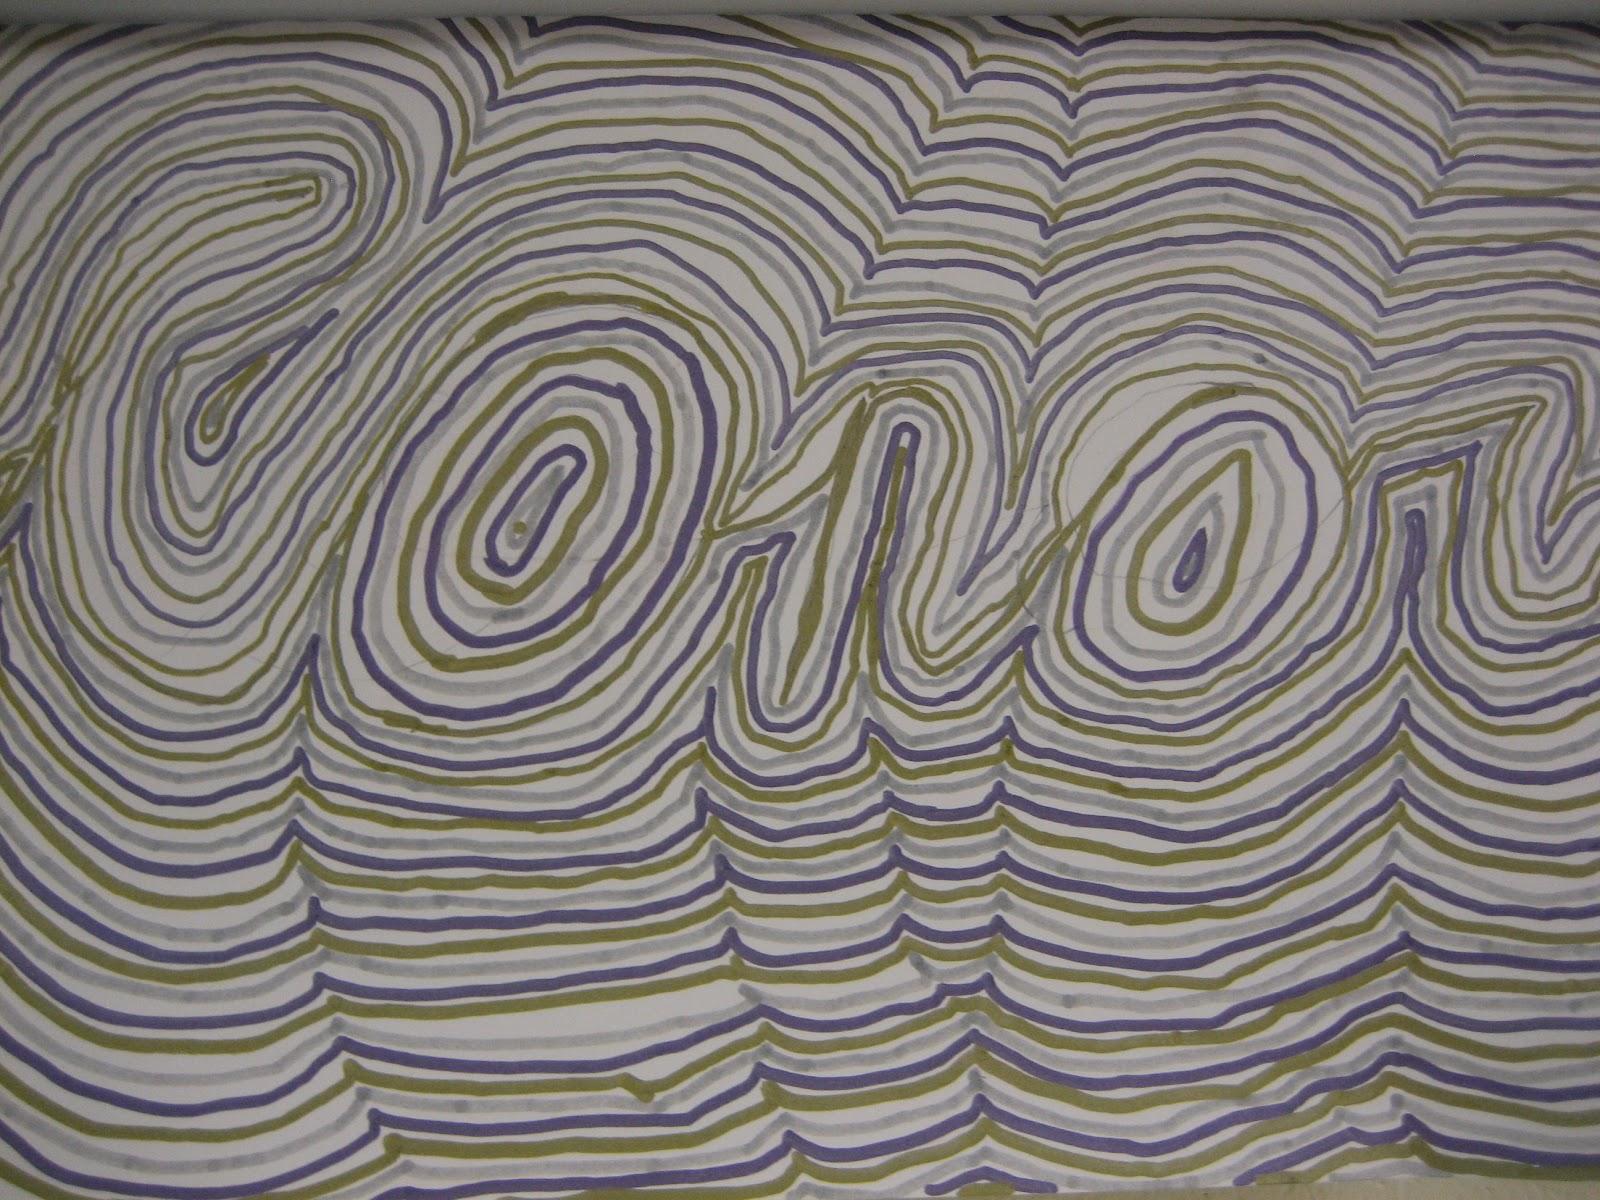 Line Design Op Art : Creations from young minds fourth grade line design op art